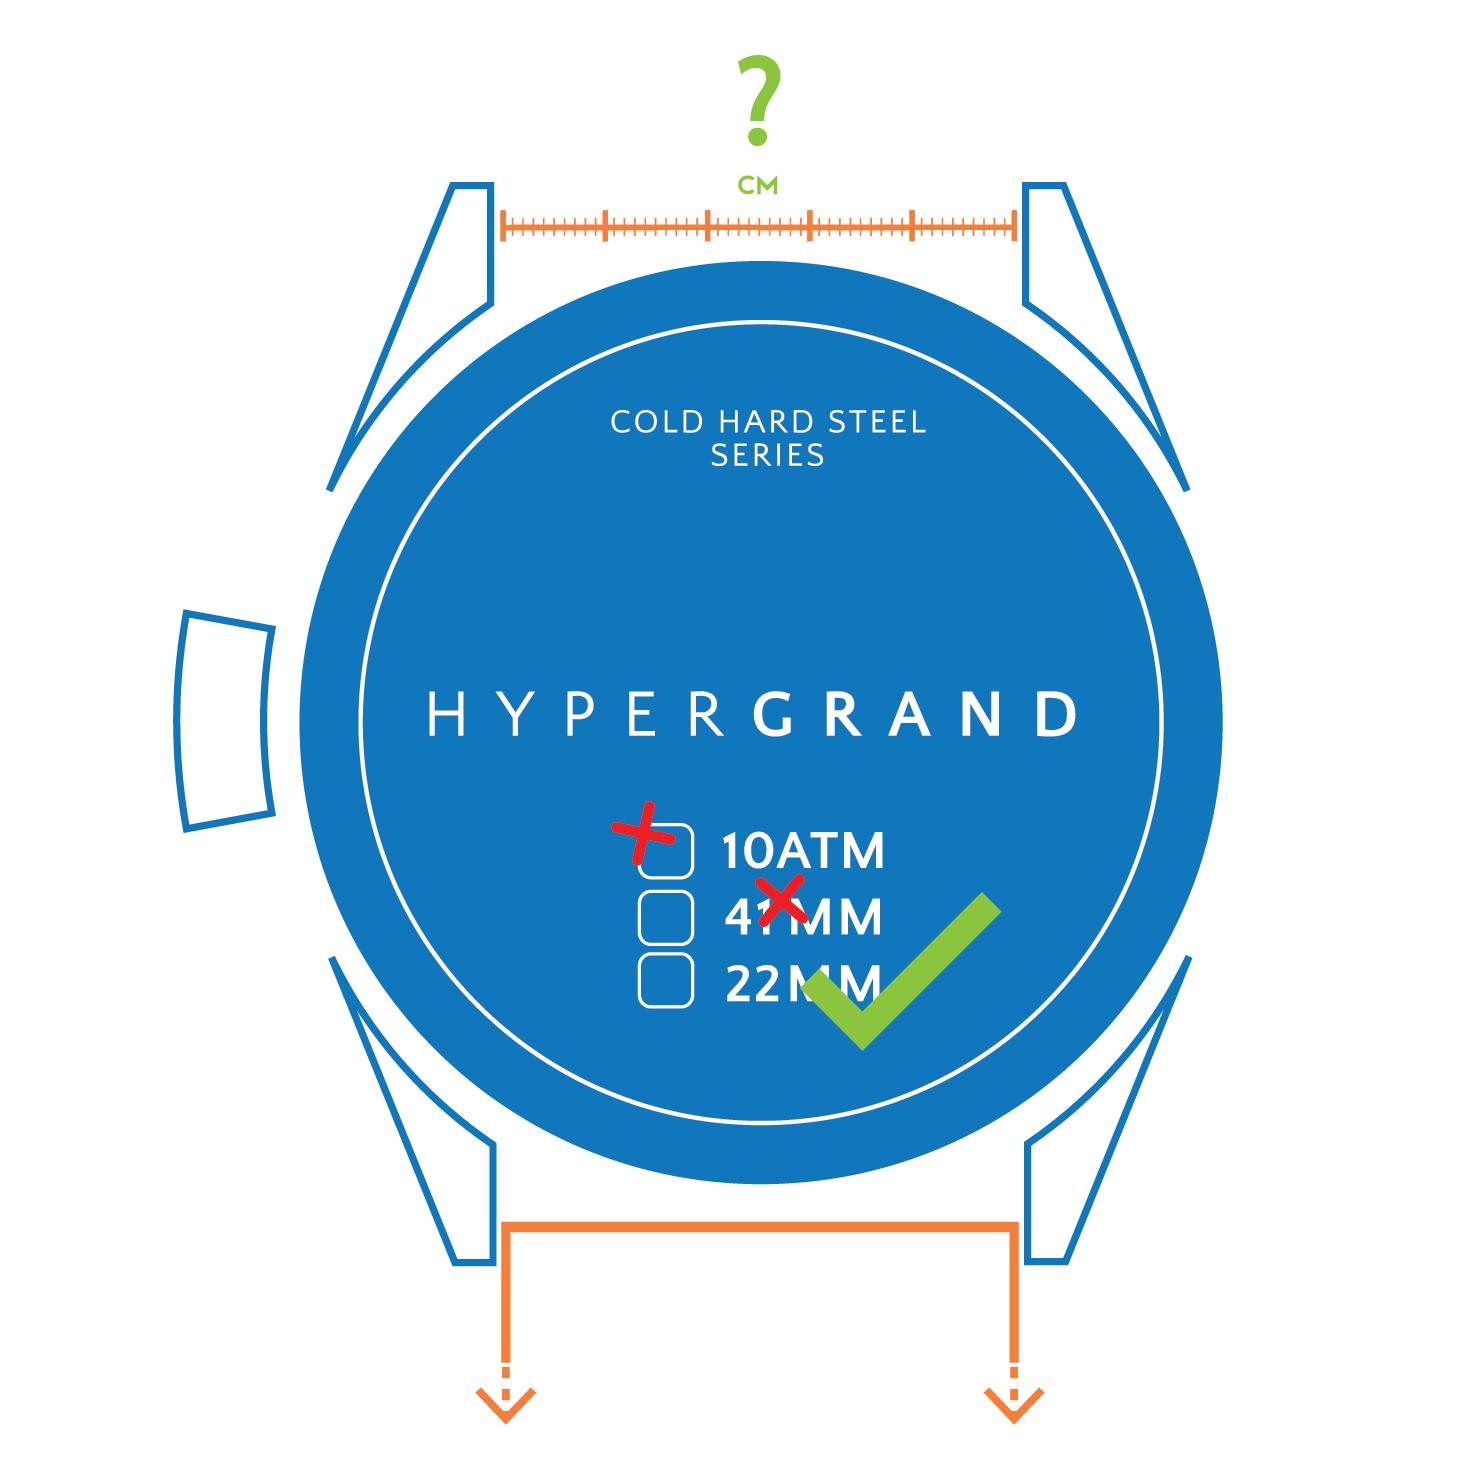 Hypergrand